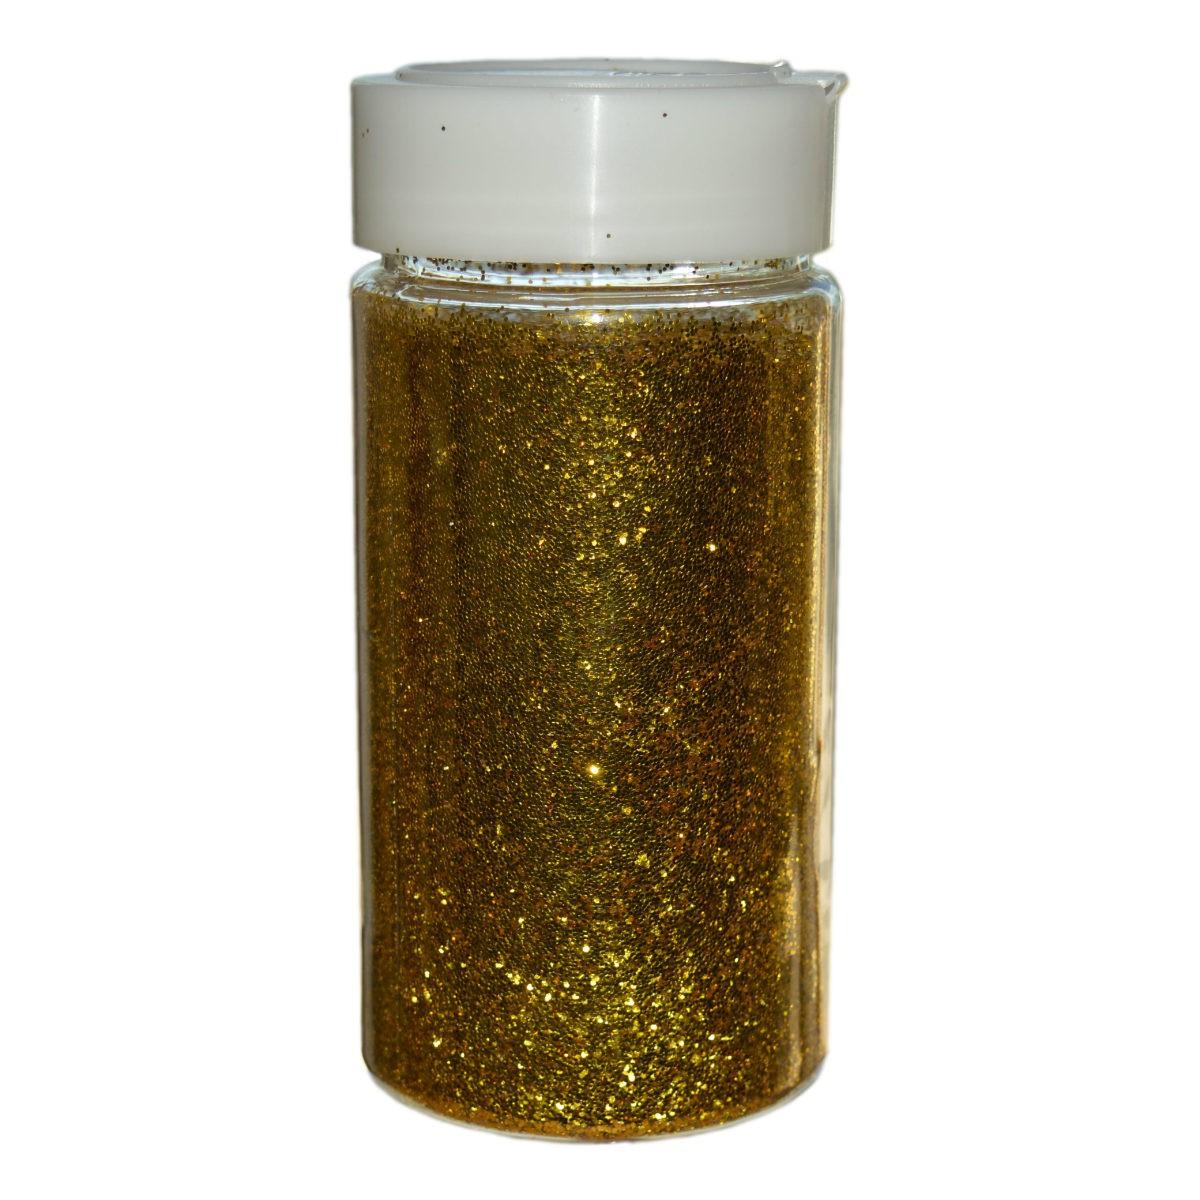 Glitter Gold Großpackung - 250g Streudose - Deko Glitzer/Glimmer zum Basteln